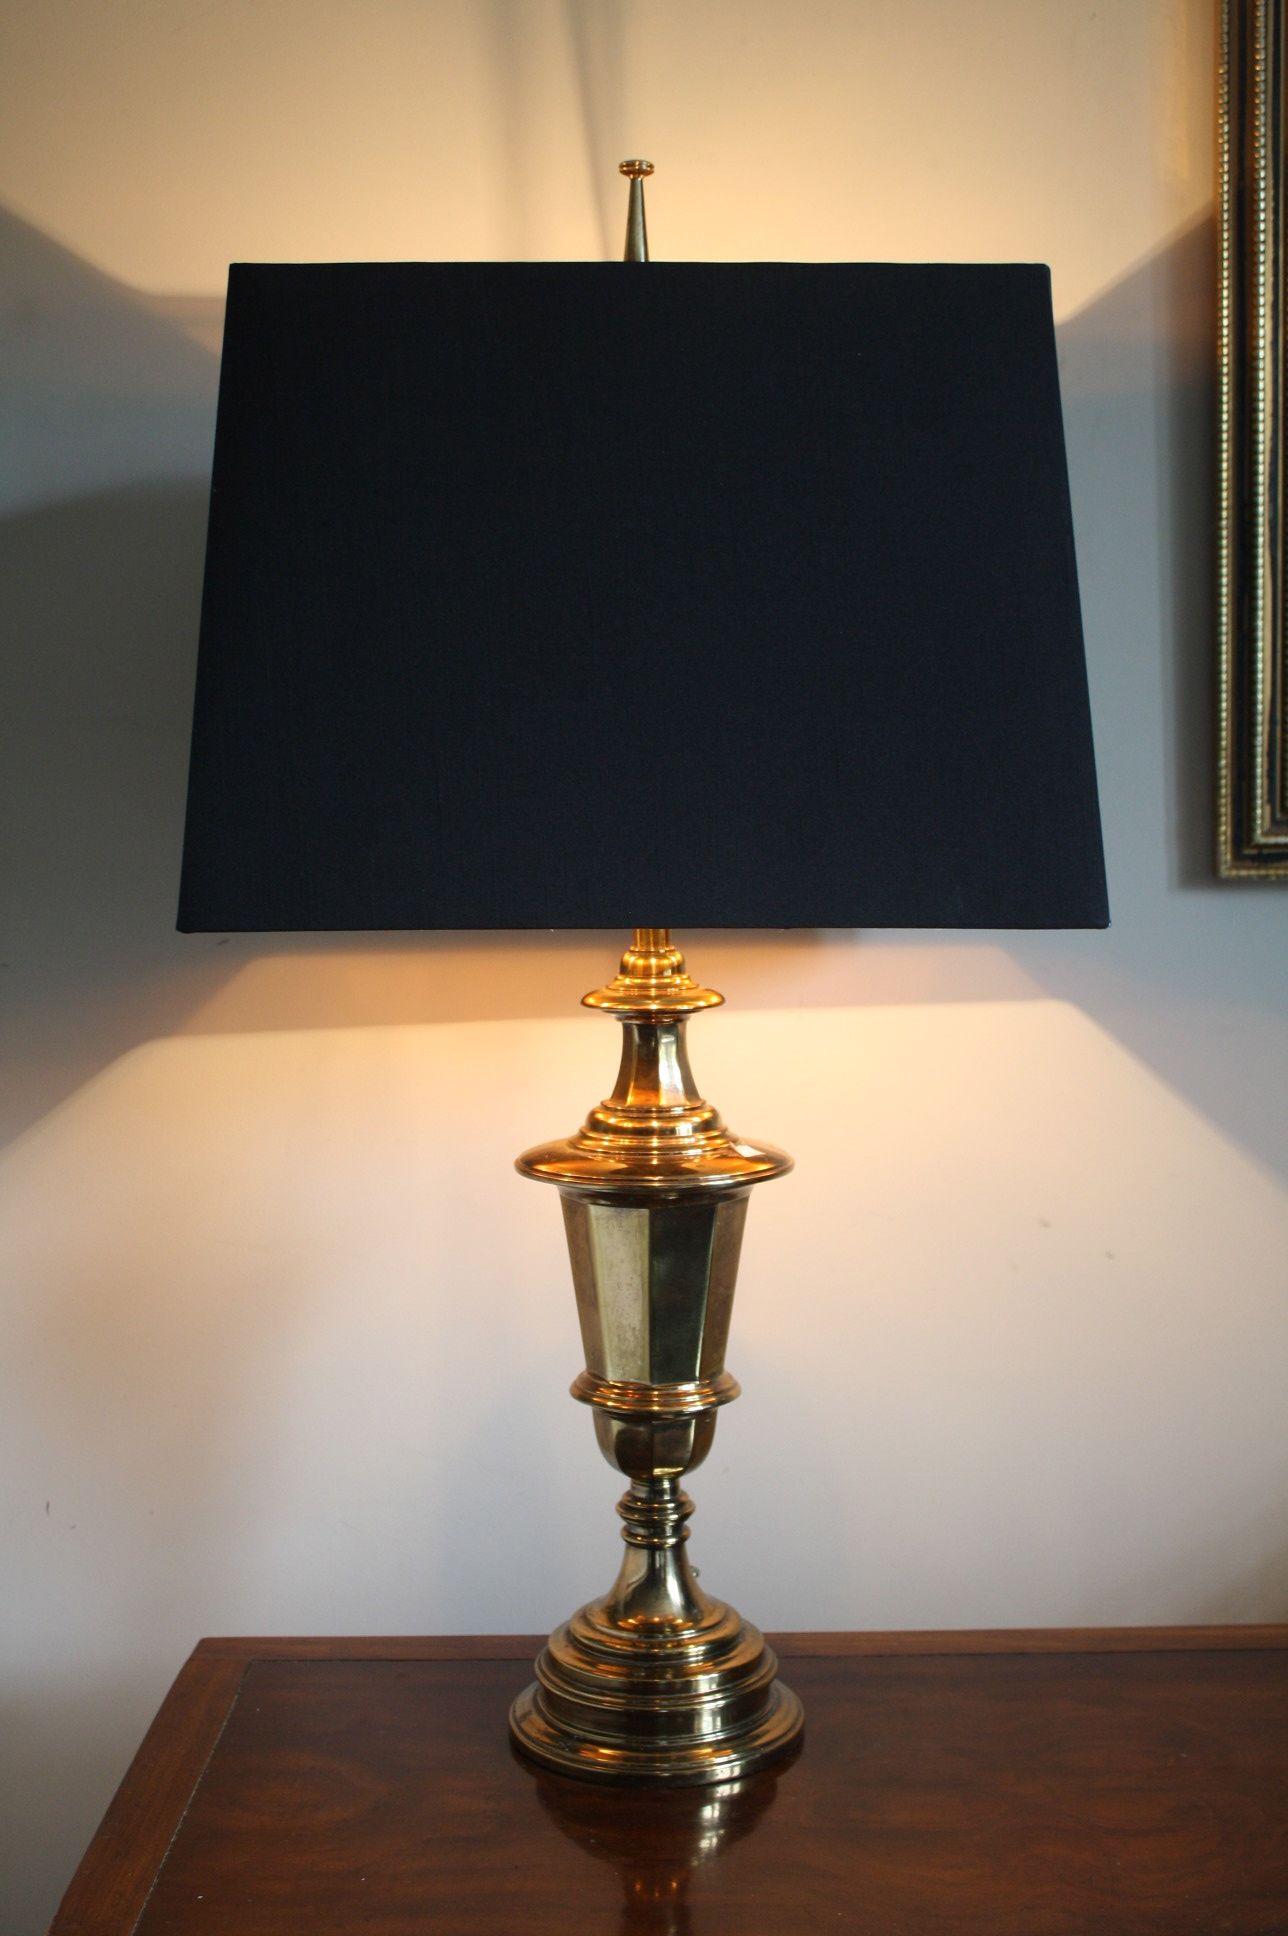 Vintage Brass Lamp by Stiffel. Let's LIGHT it up